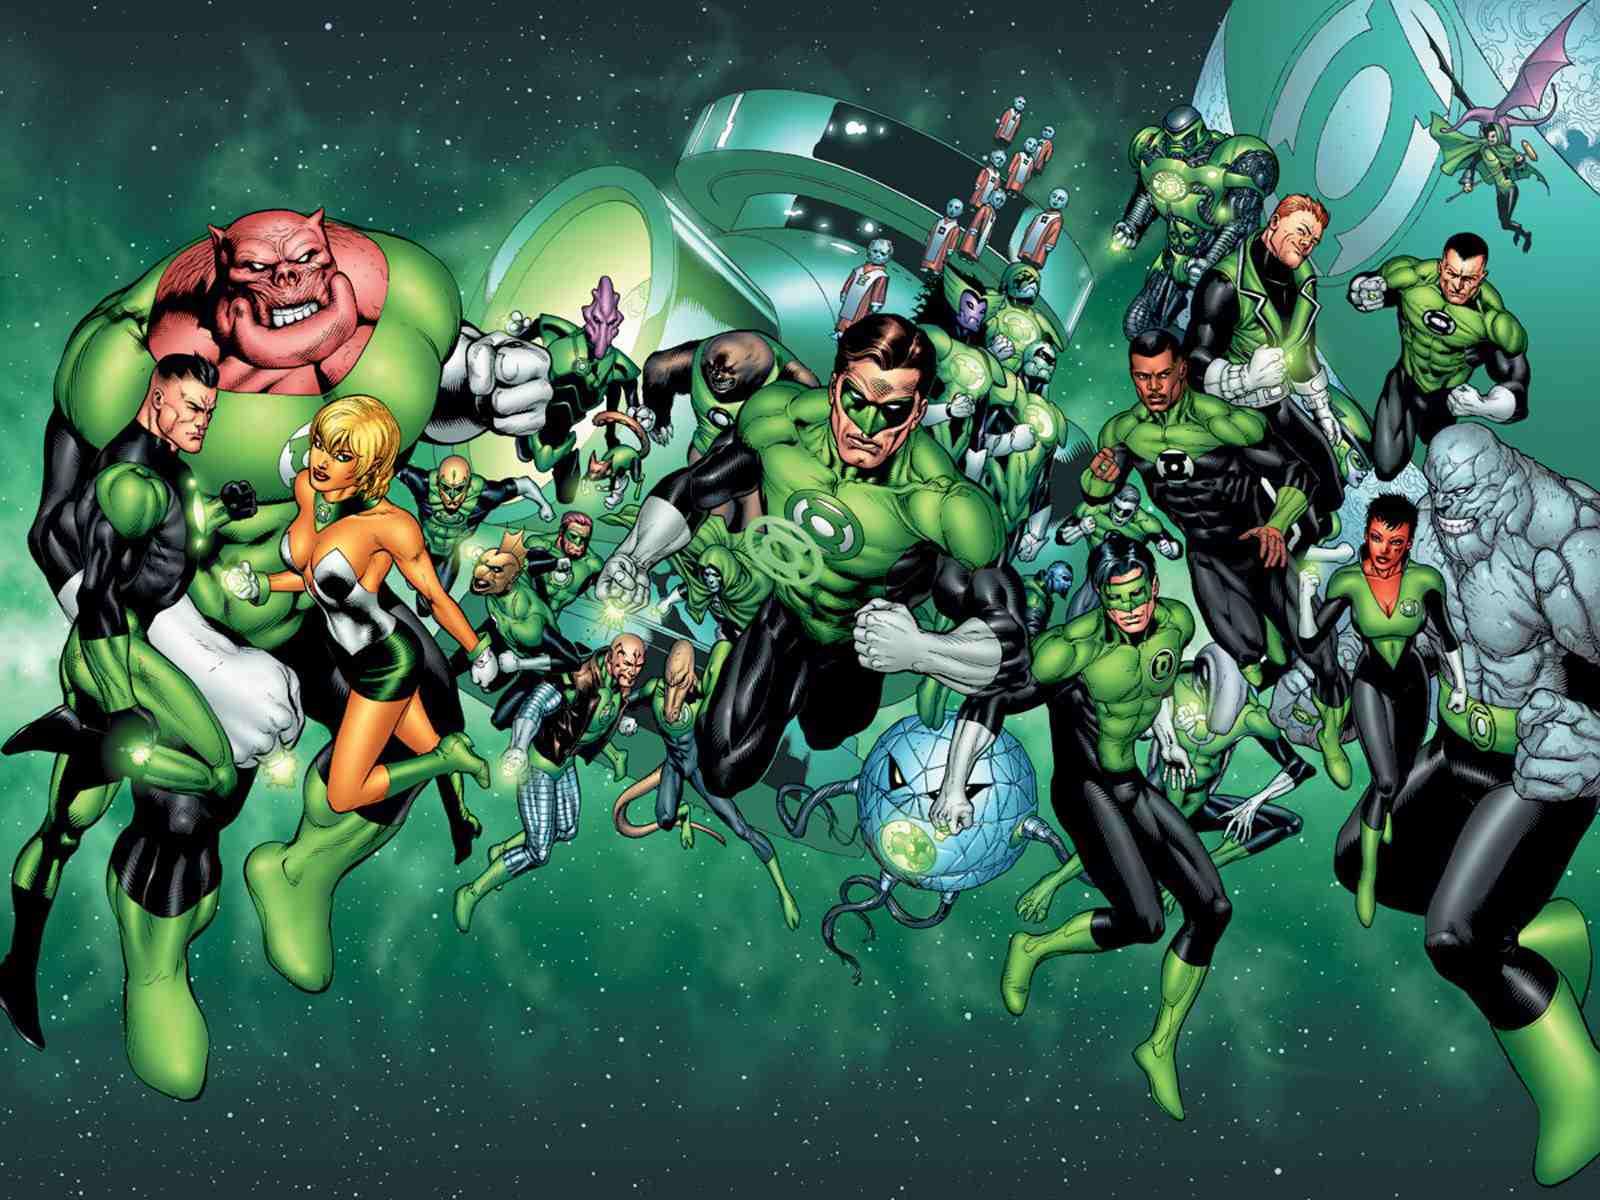 Green Lantern Corps art by Doug Mahnke